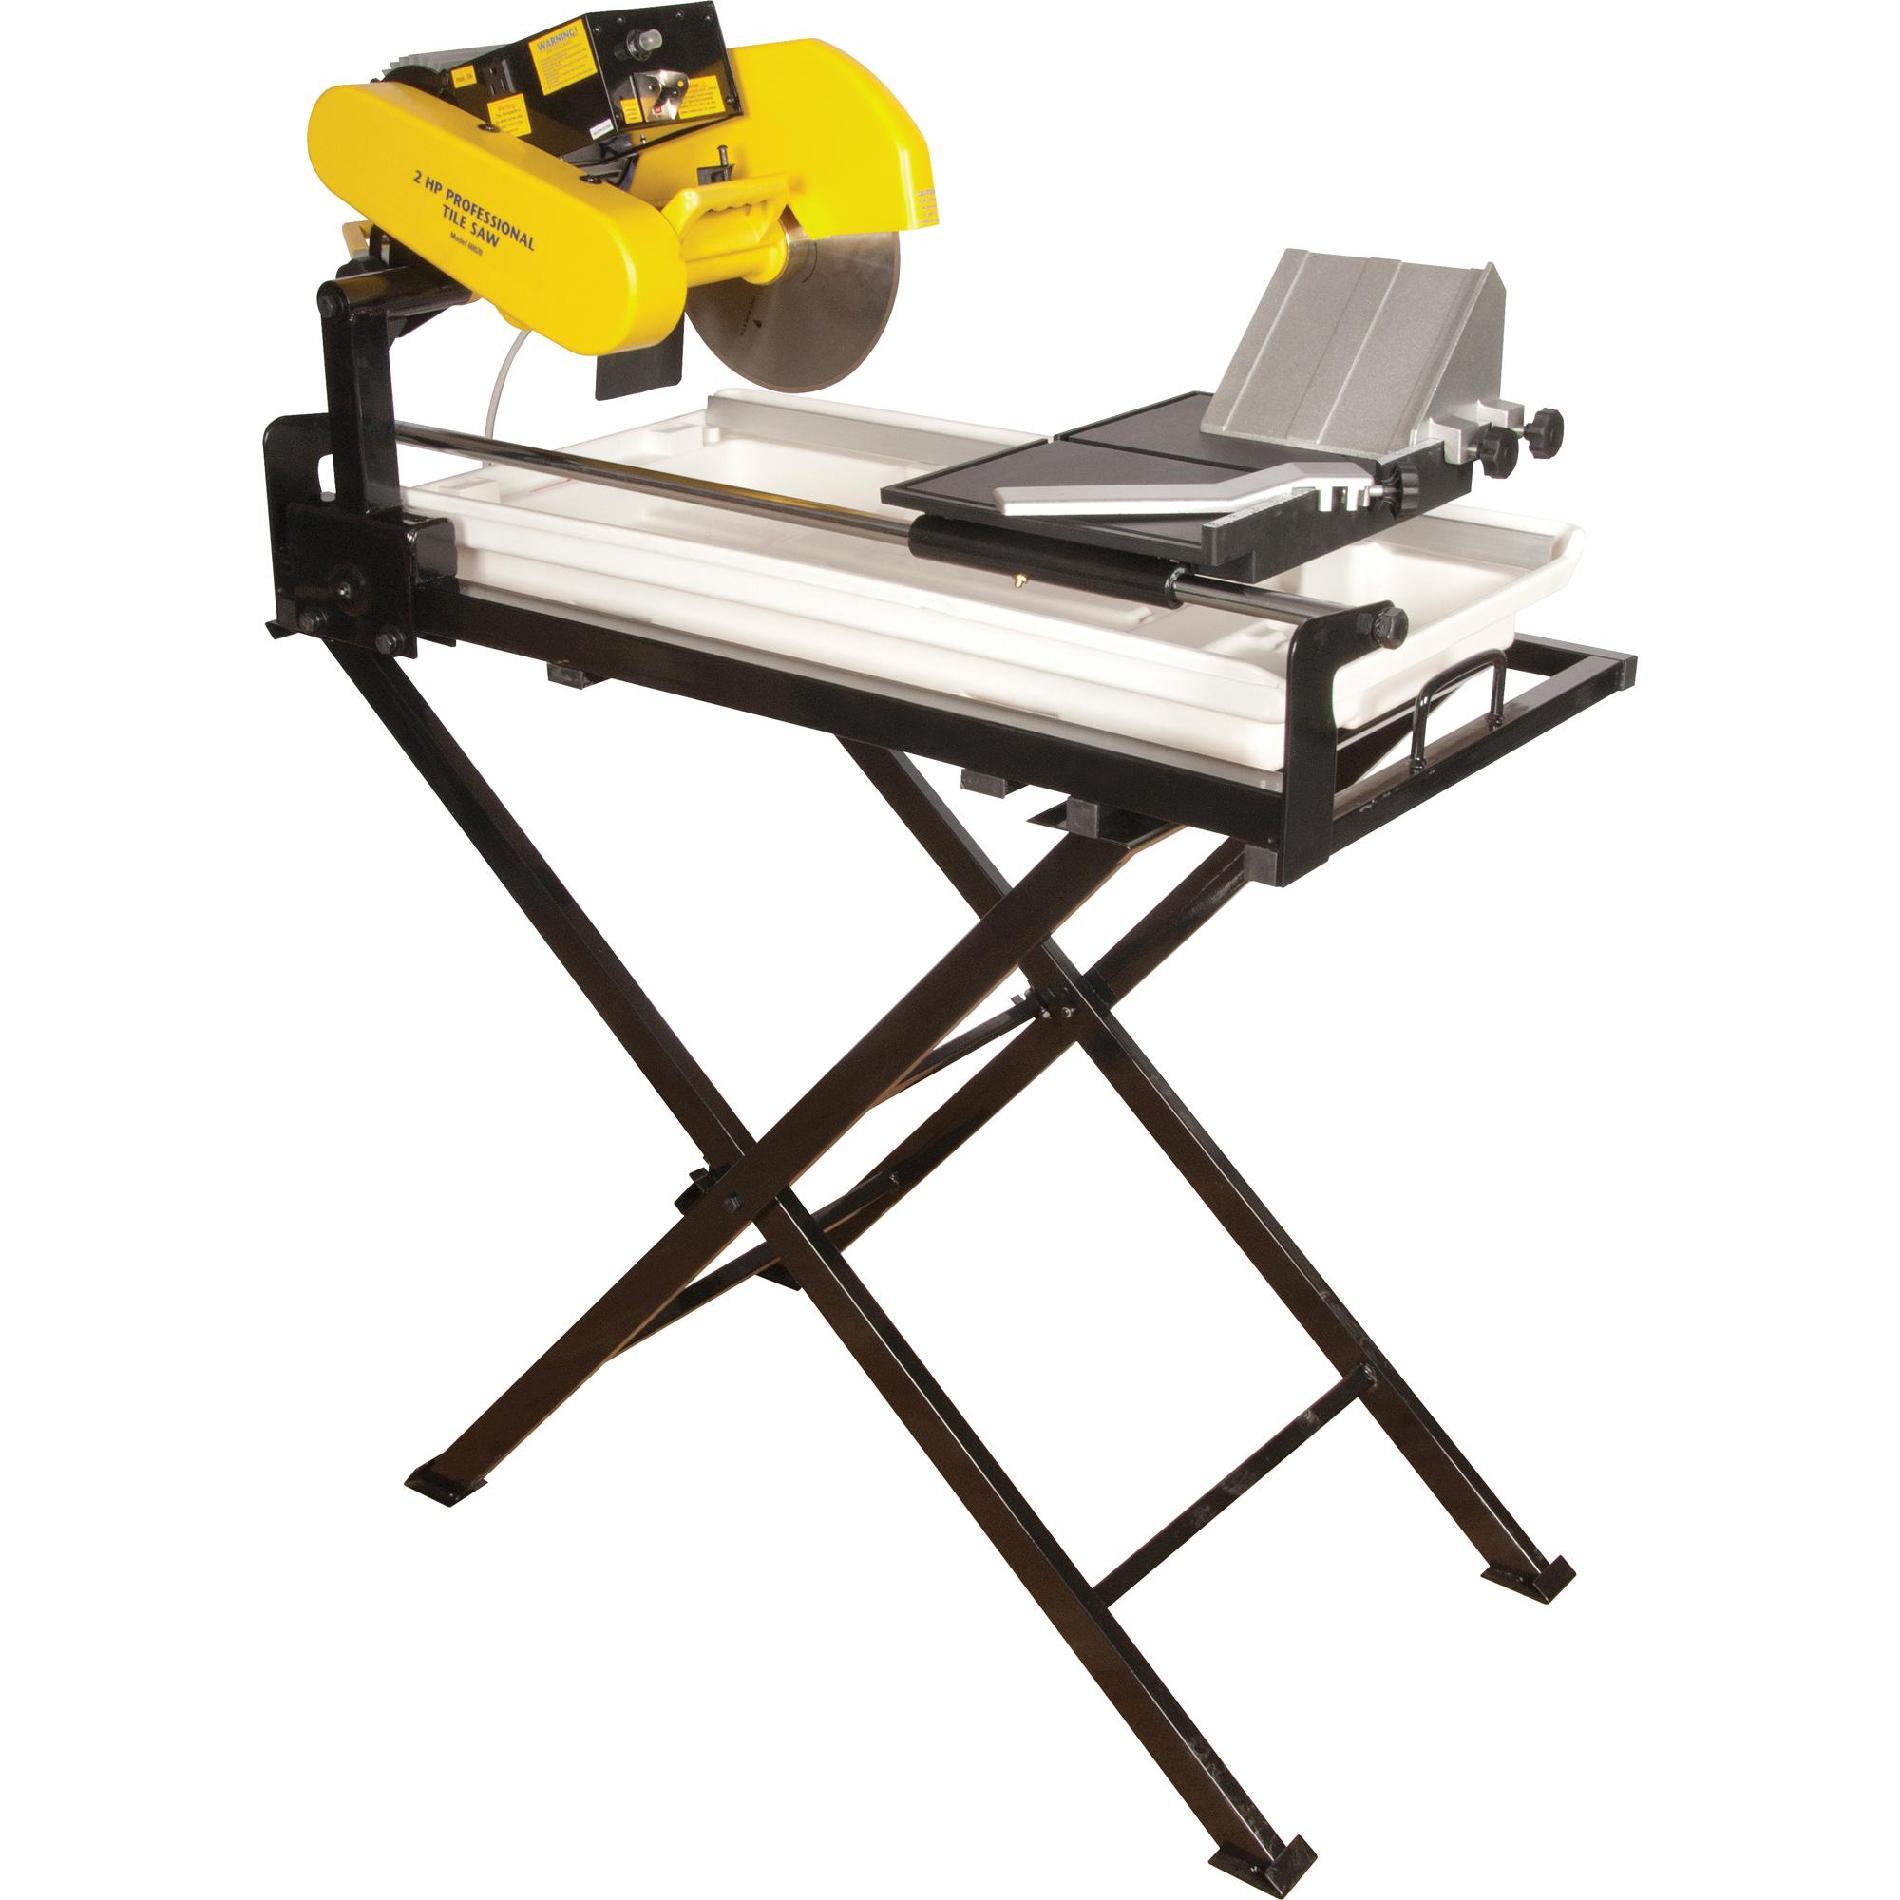 60020sq qep hand tools distributors